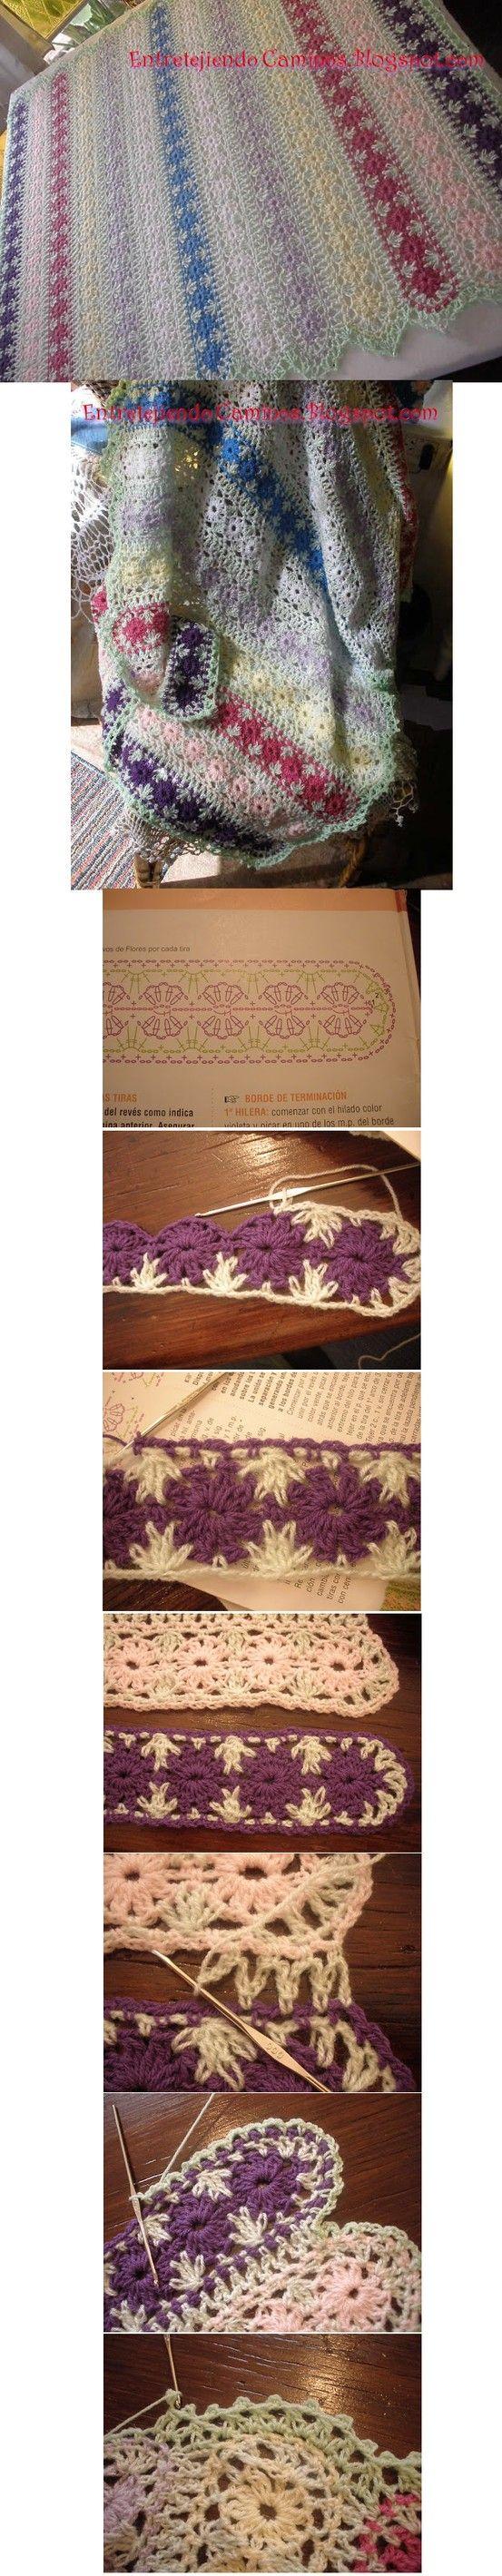 nice version of the crochet mile-a-minute blanket! http://entretejiendocaminos.blogspot.com/search?q=yo+yo%5C